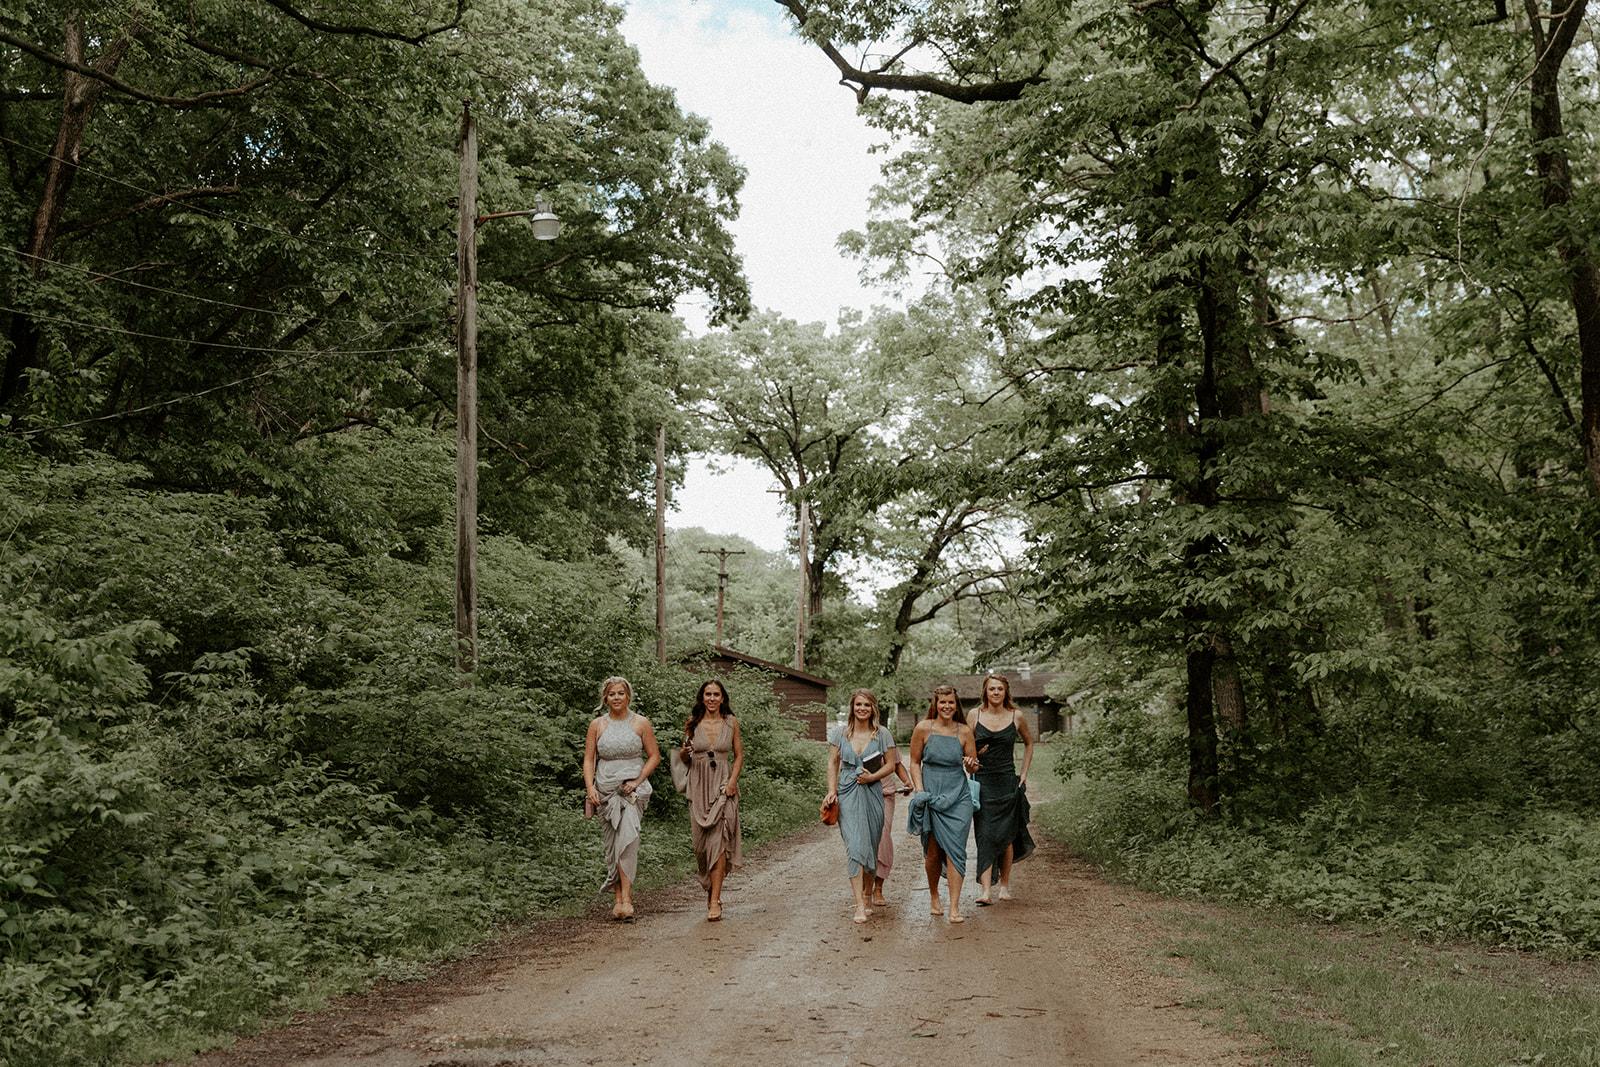 camp_wokanda_peoria_illinois_wedding_photographer_wright_photographs_bliese_0134.jpg